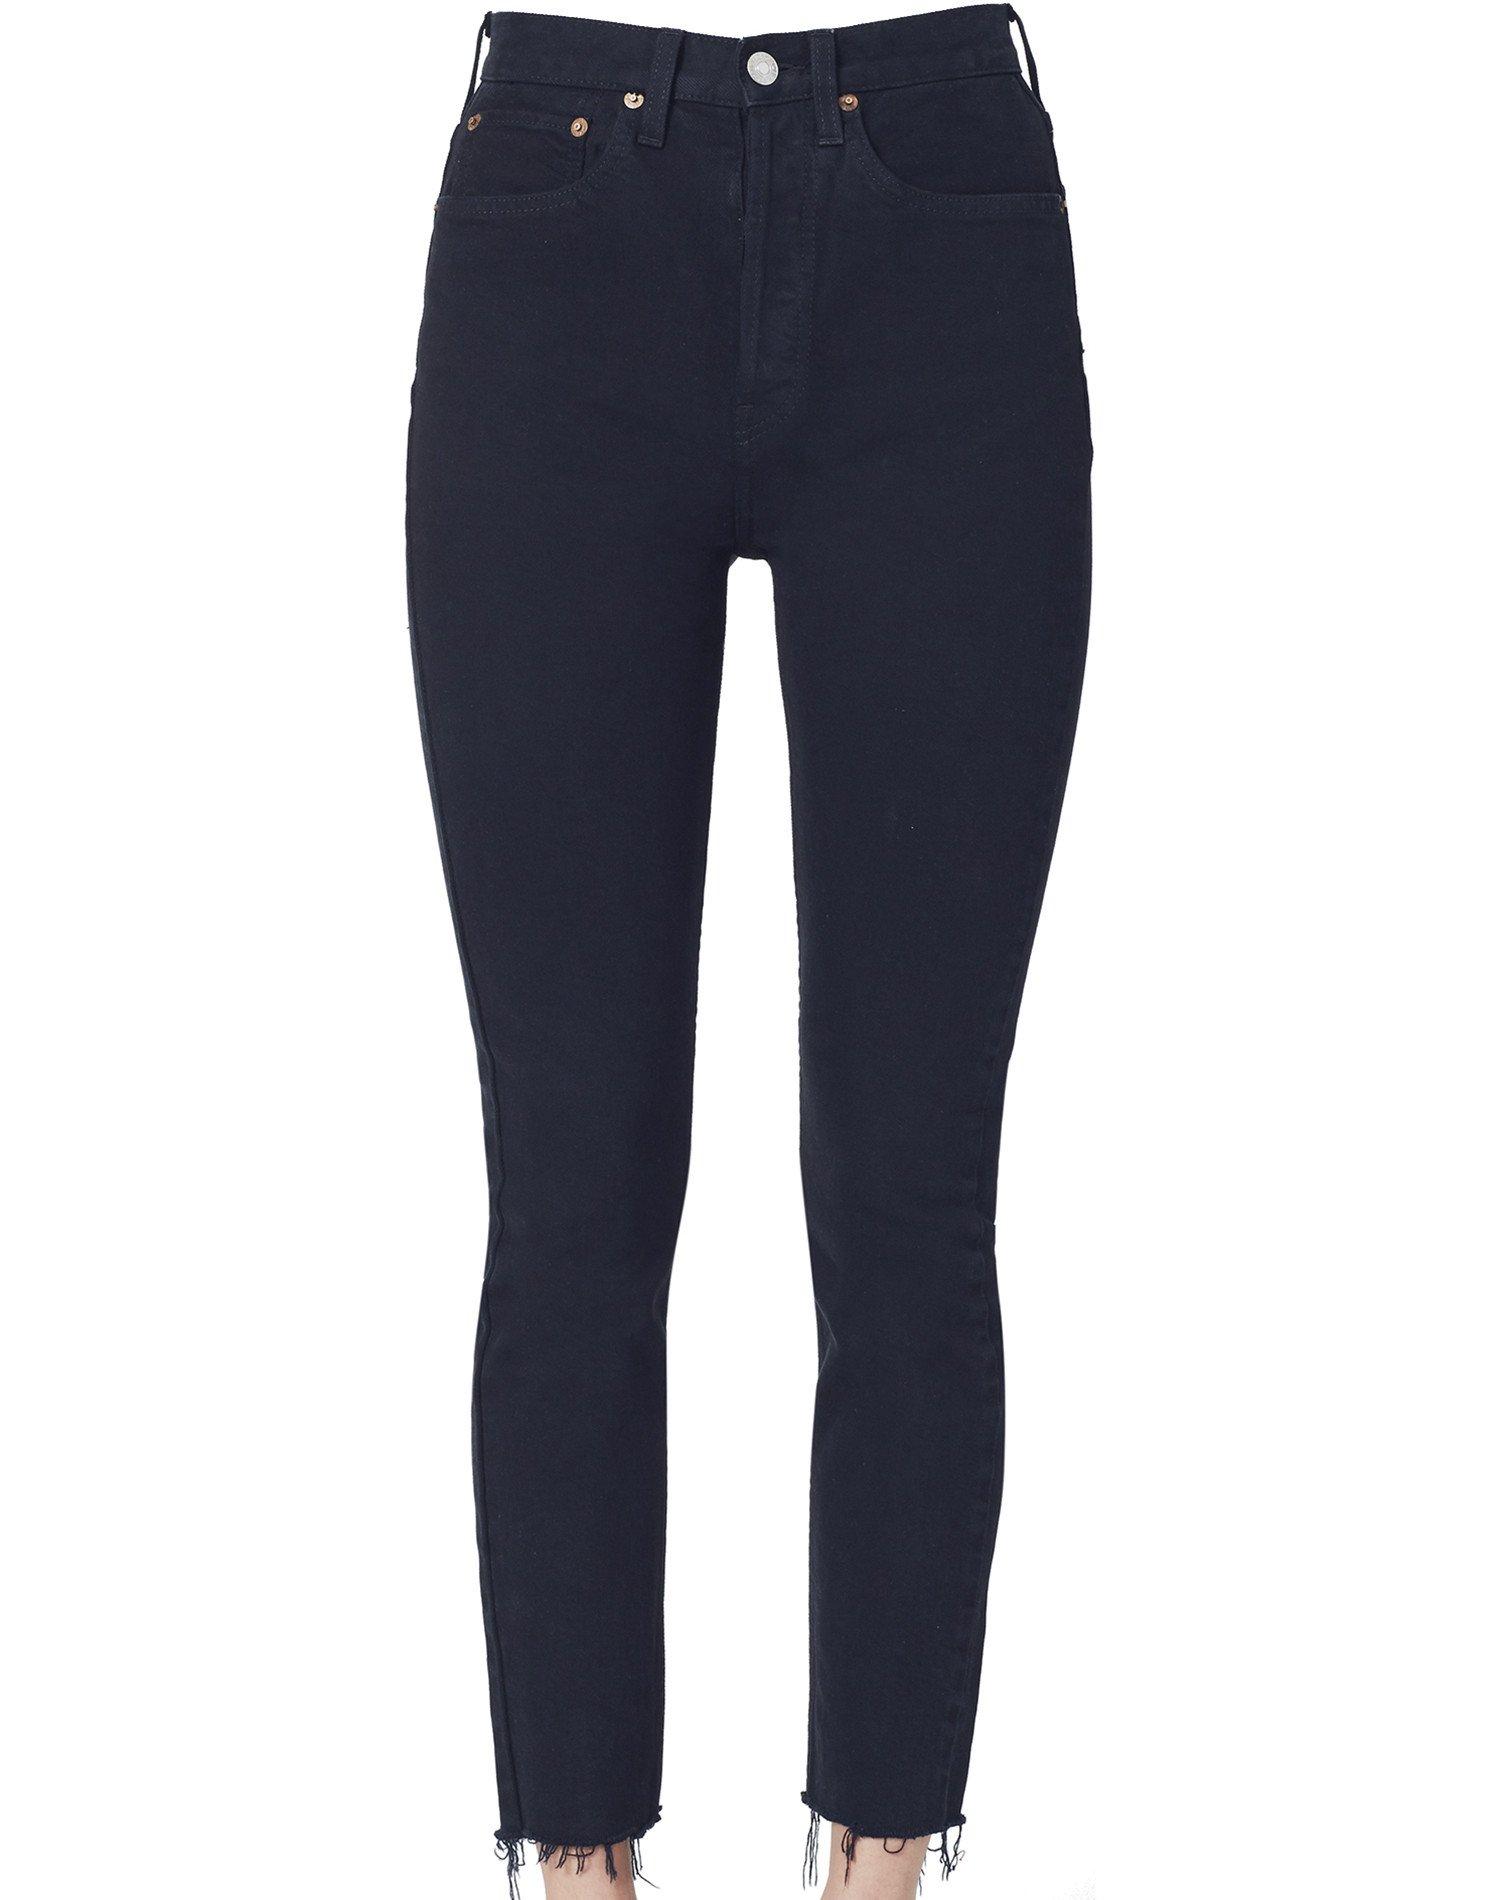 Stretch High Rise Ankle Crop - Black